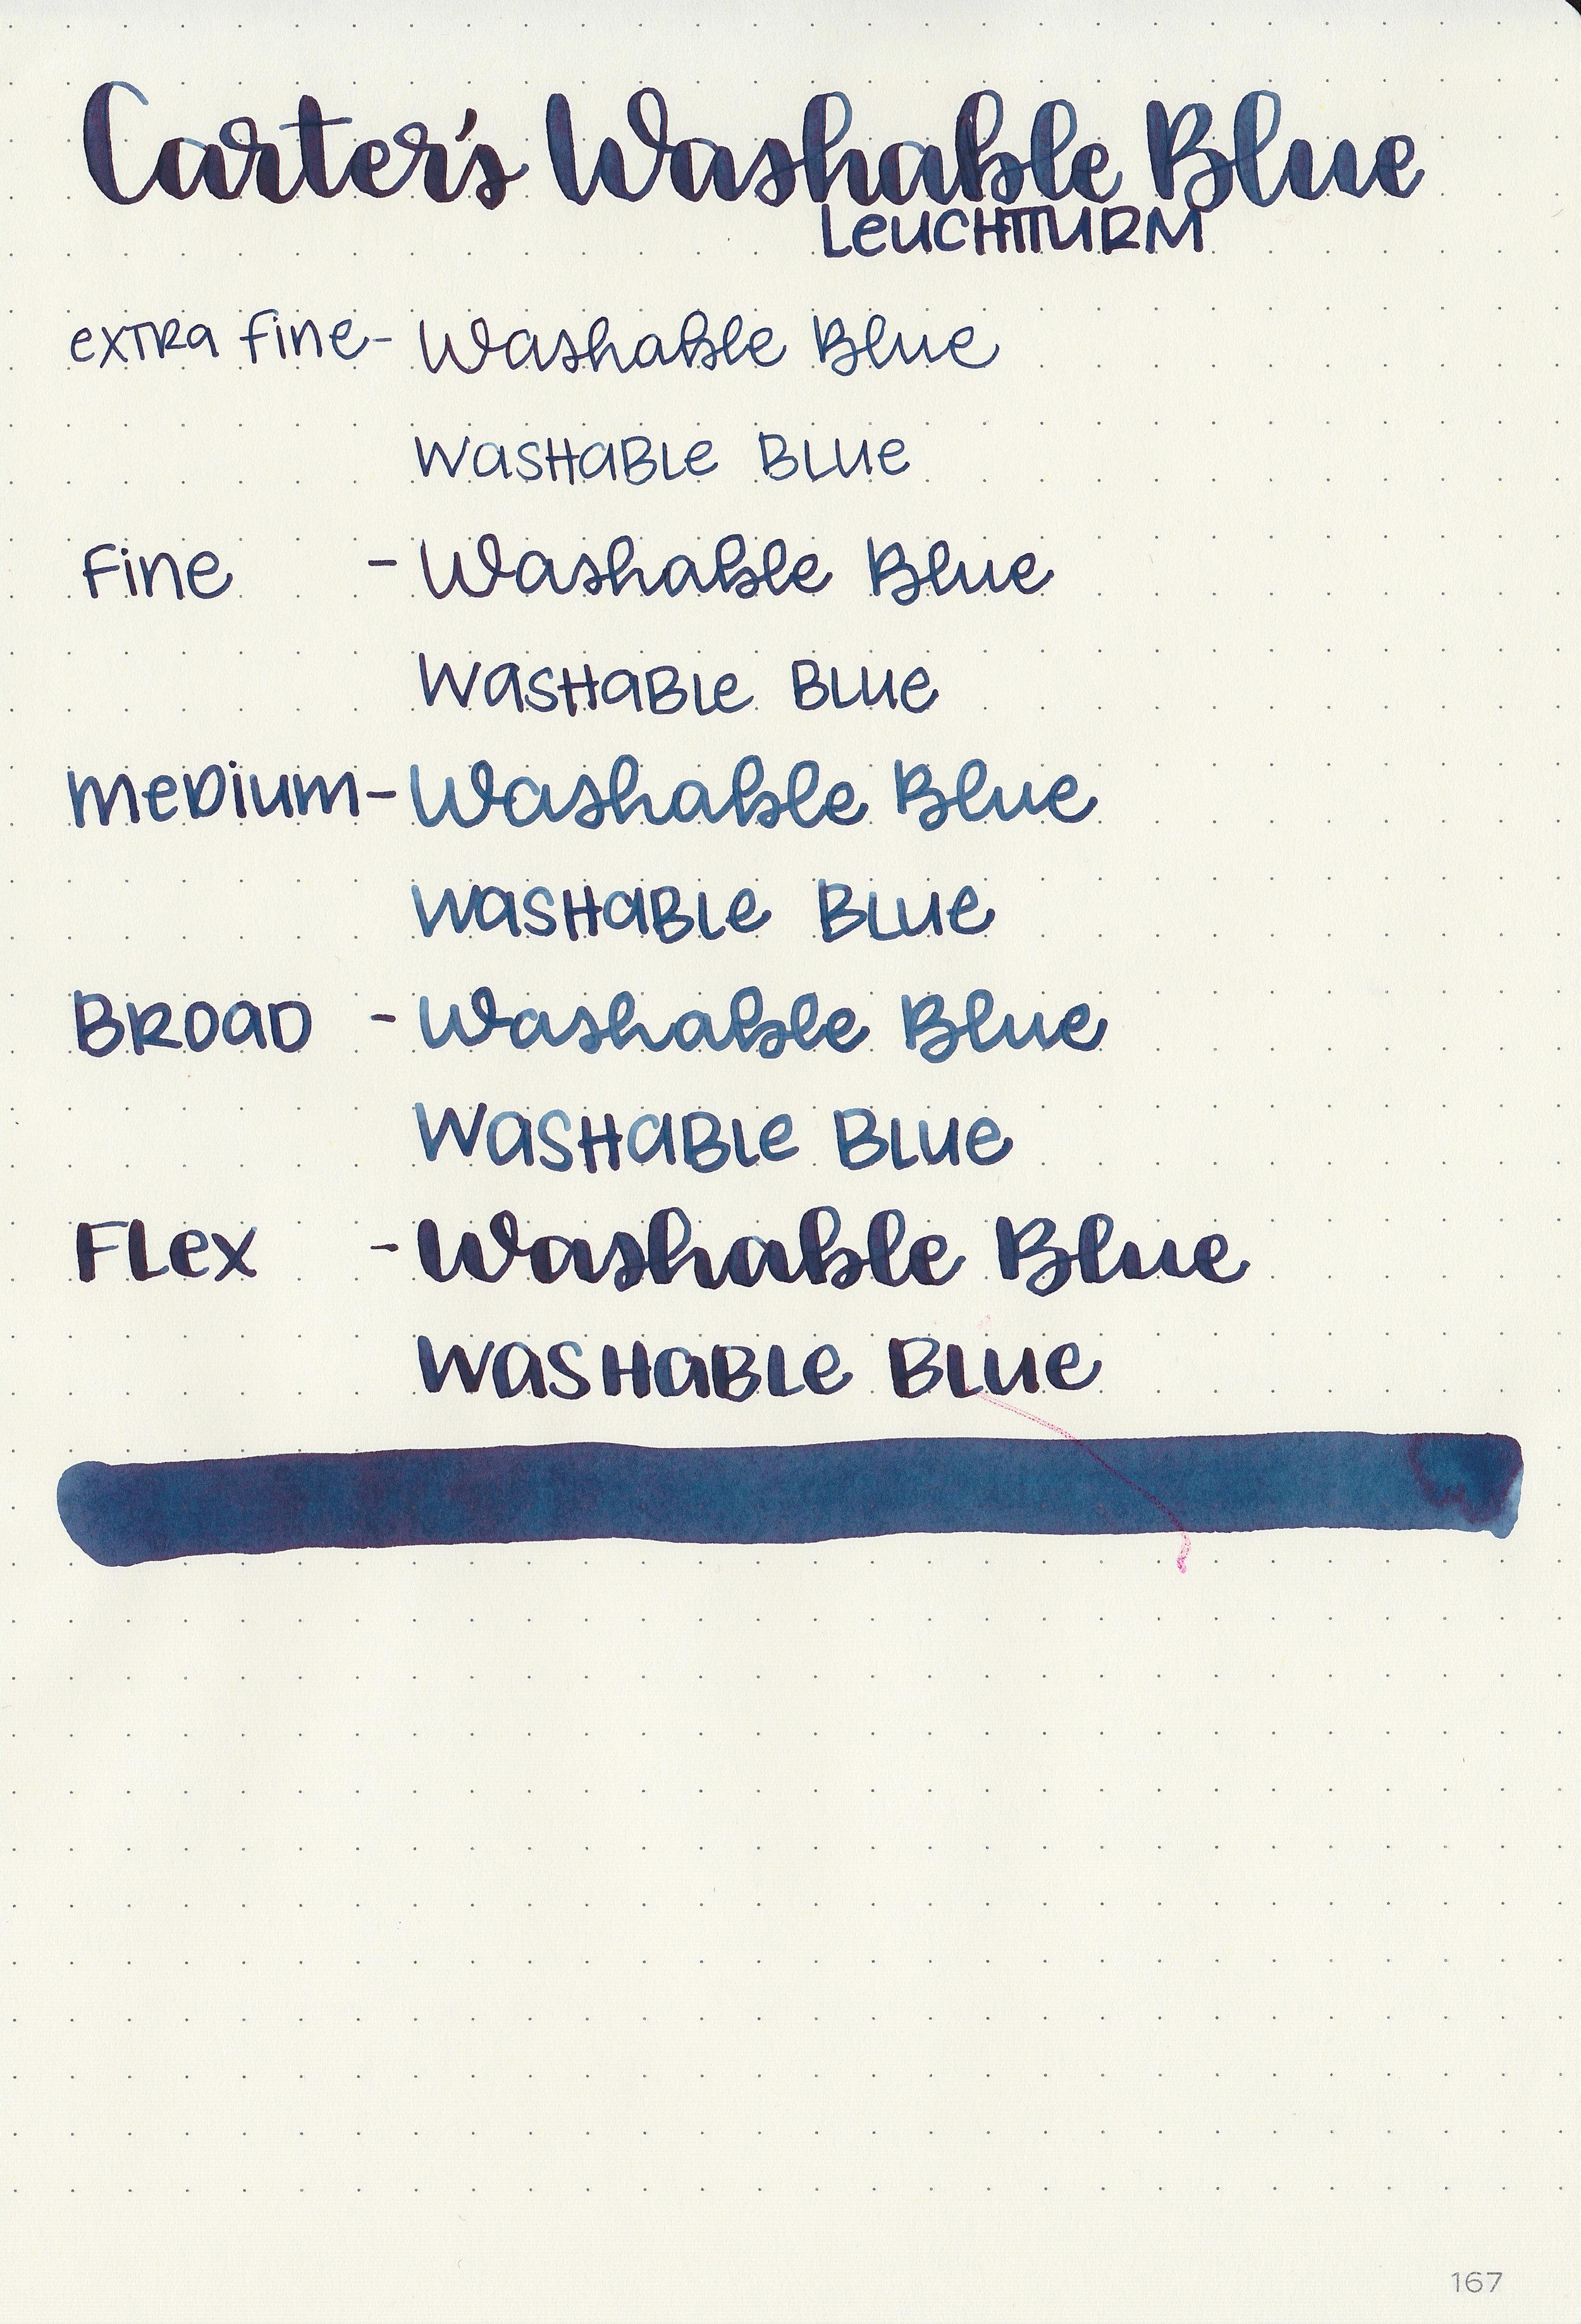 cart-washable-blue-8.jpg